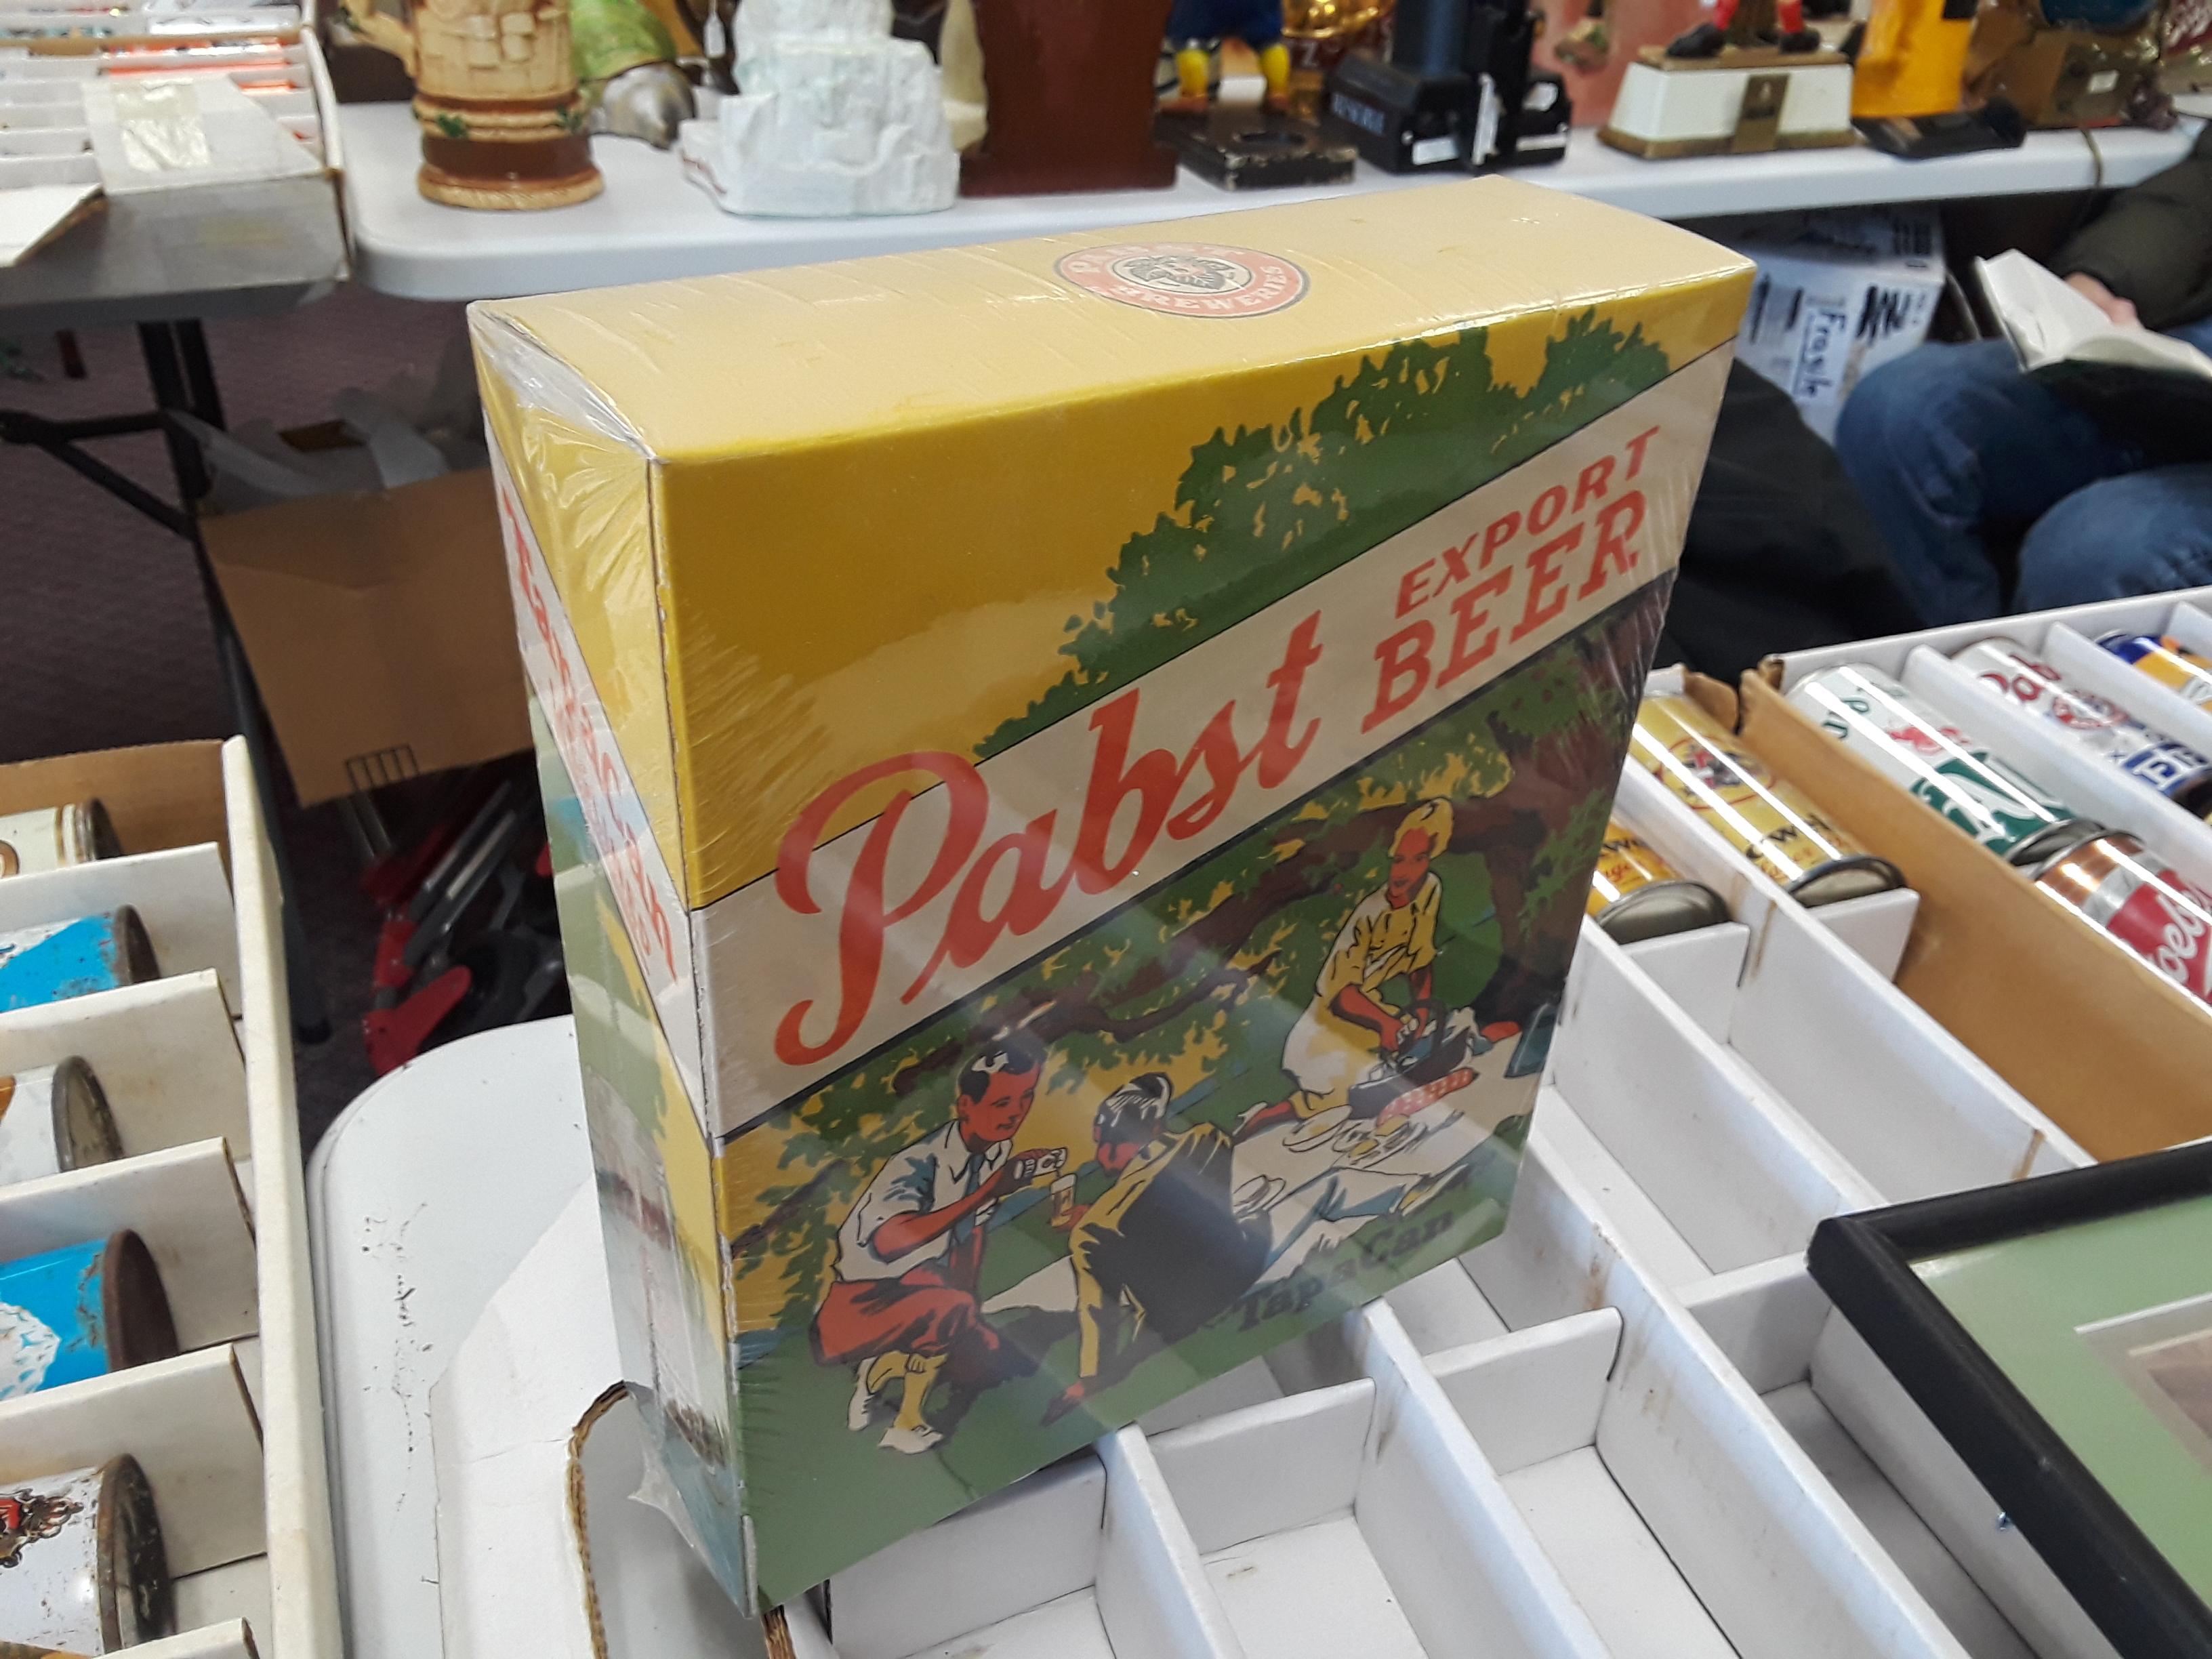 Winterfest pabst carton